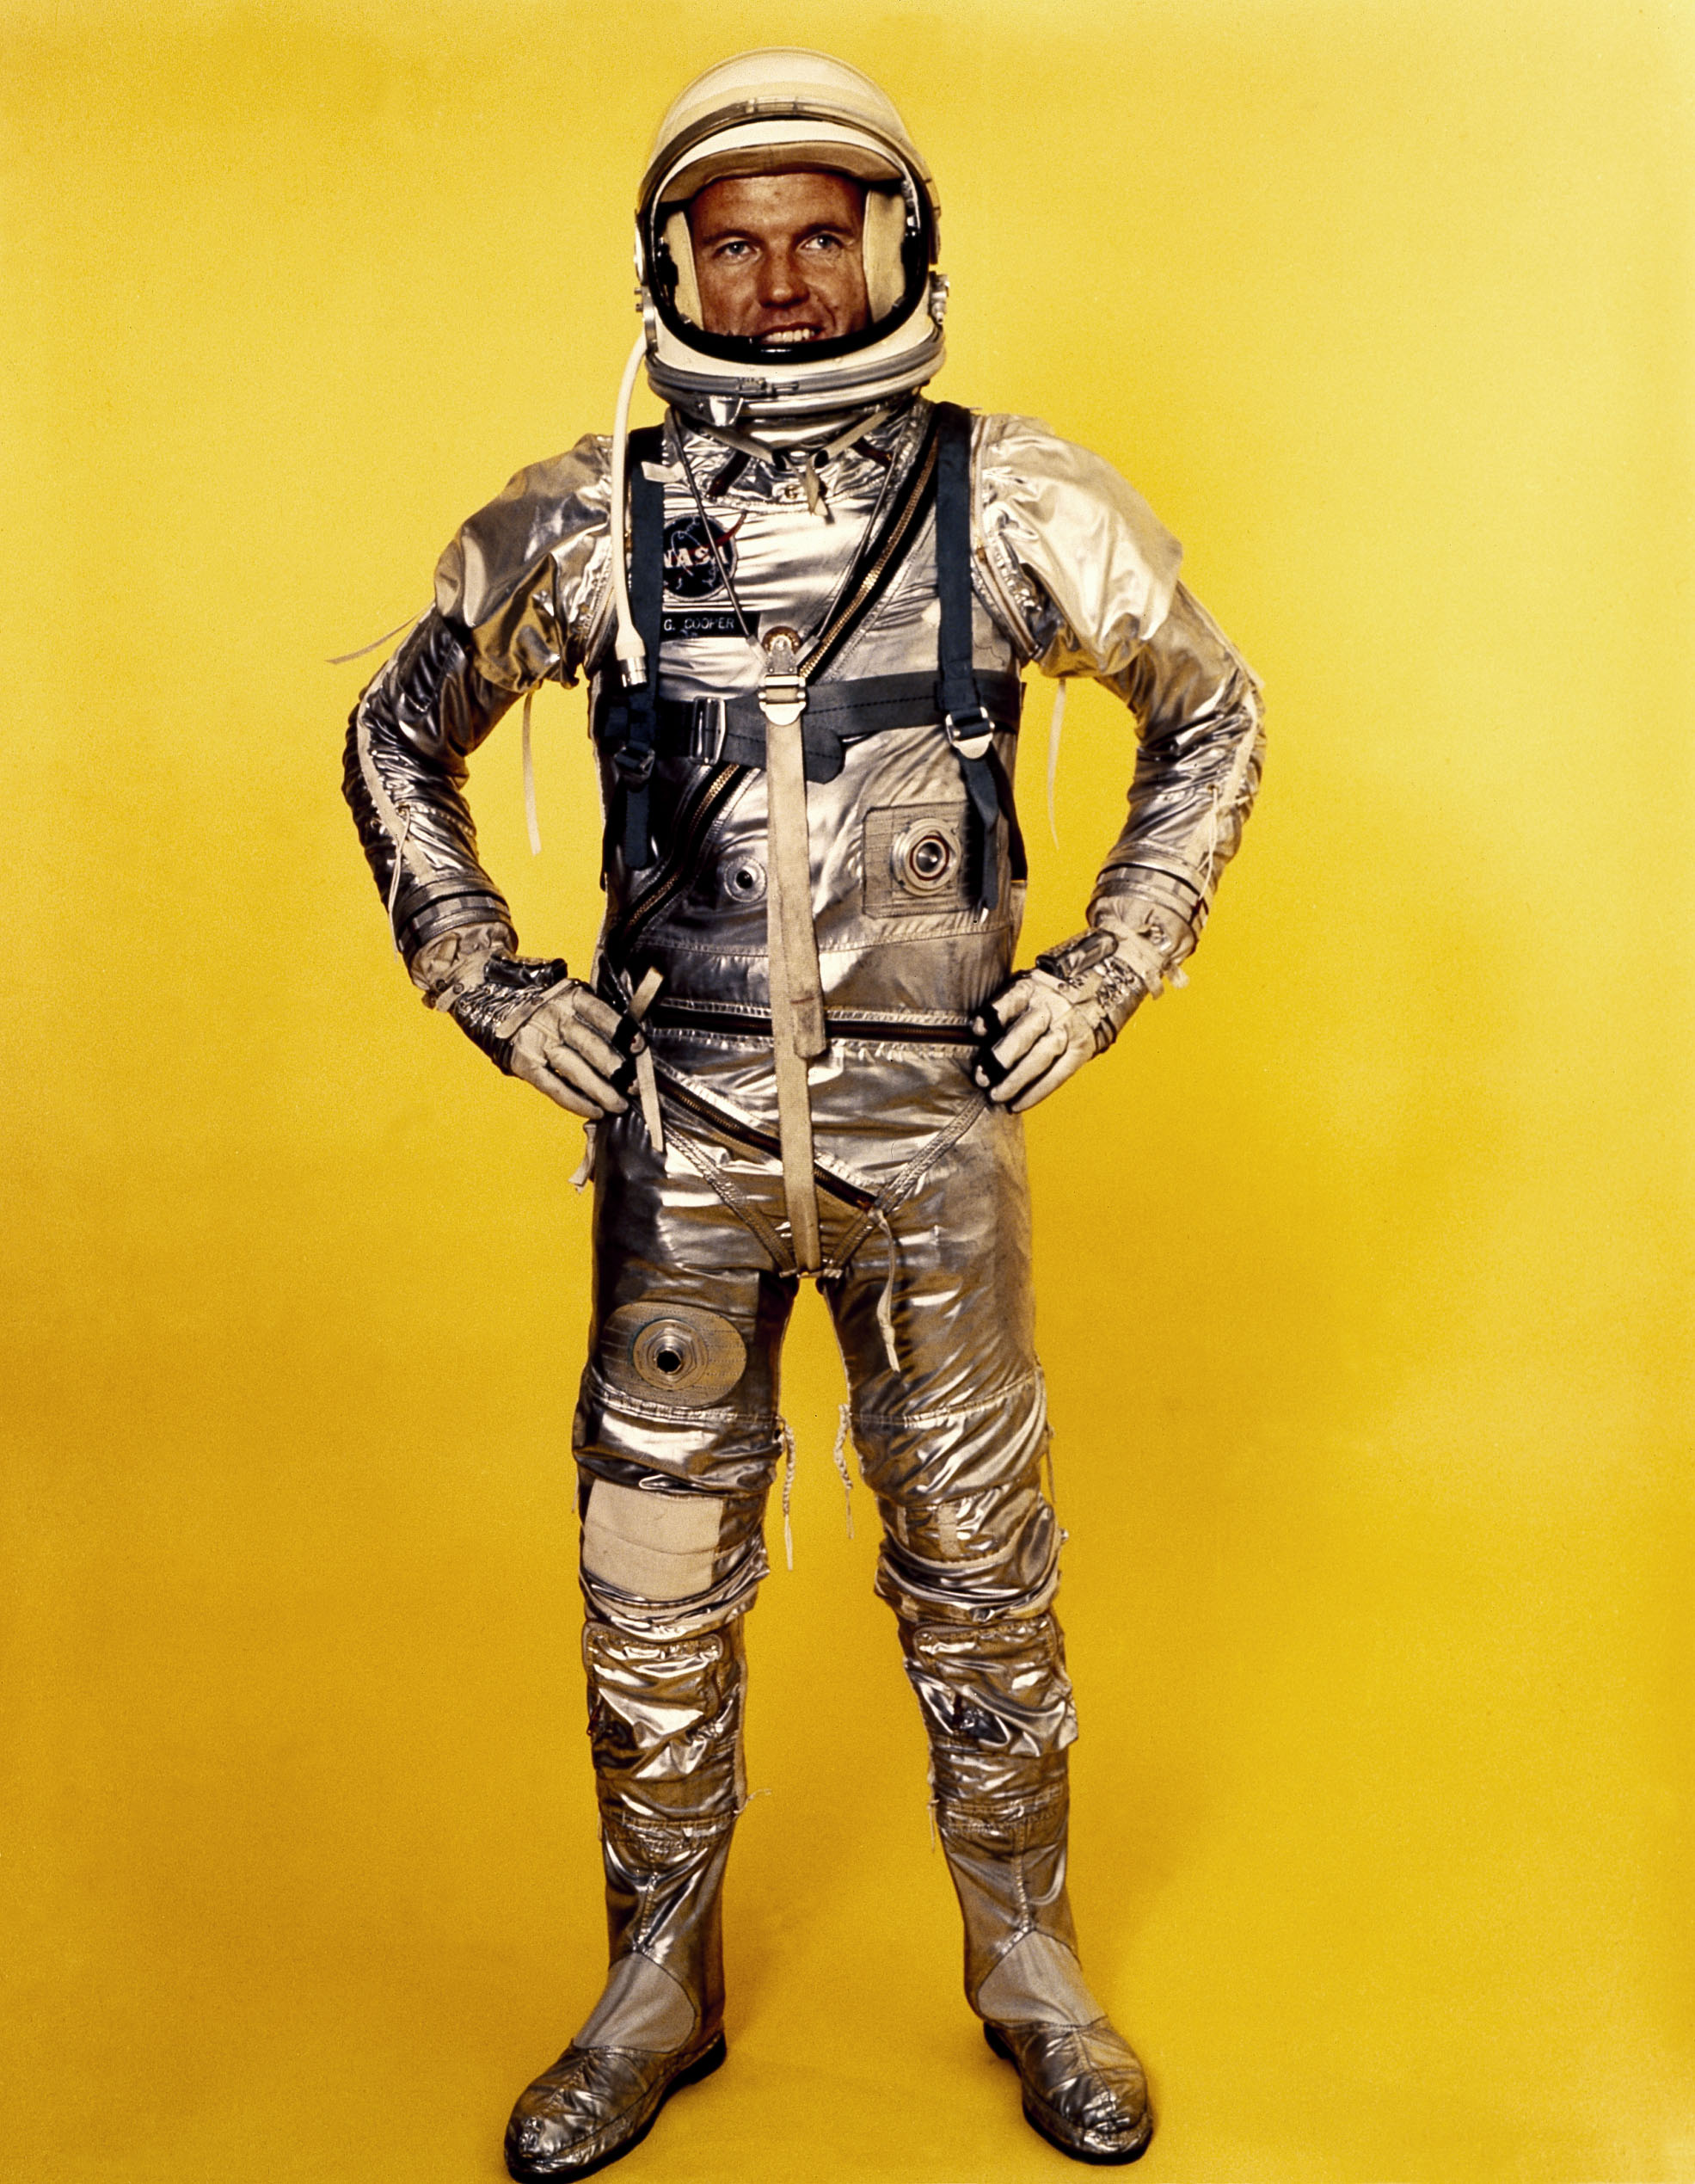 Gordon Cooper in Project Mercury Suit - 1959